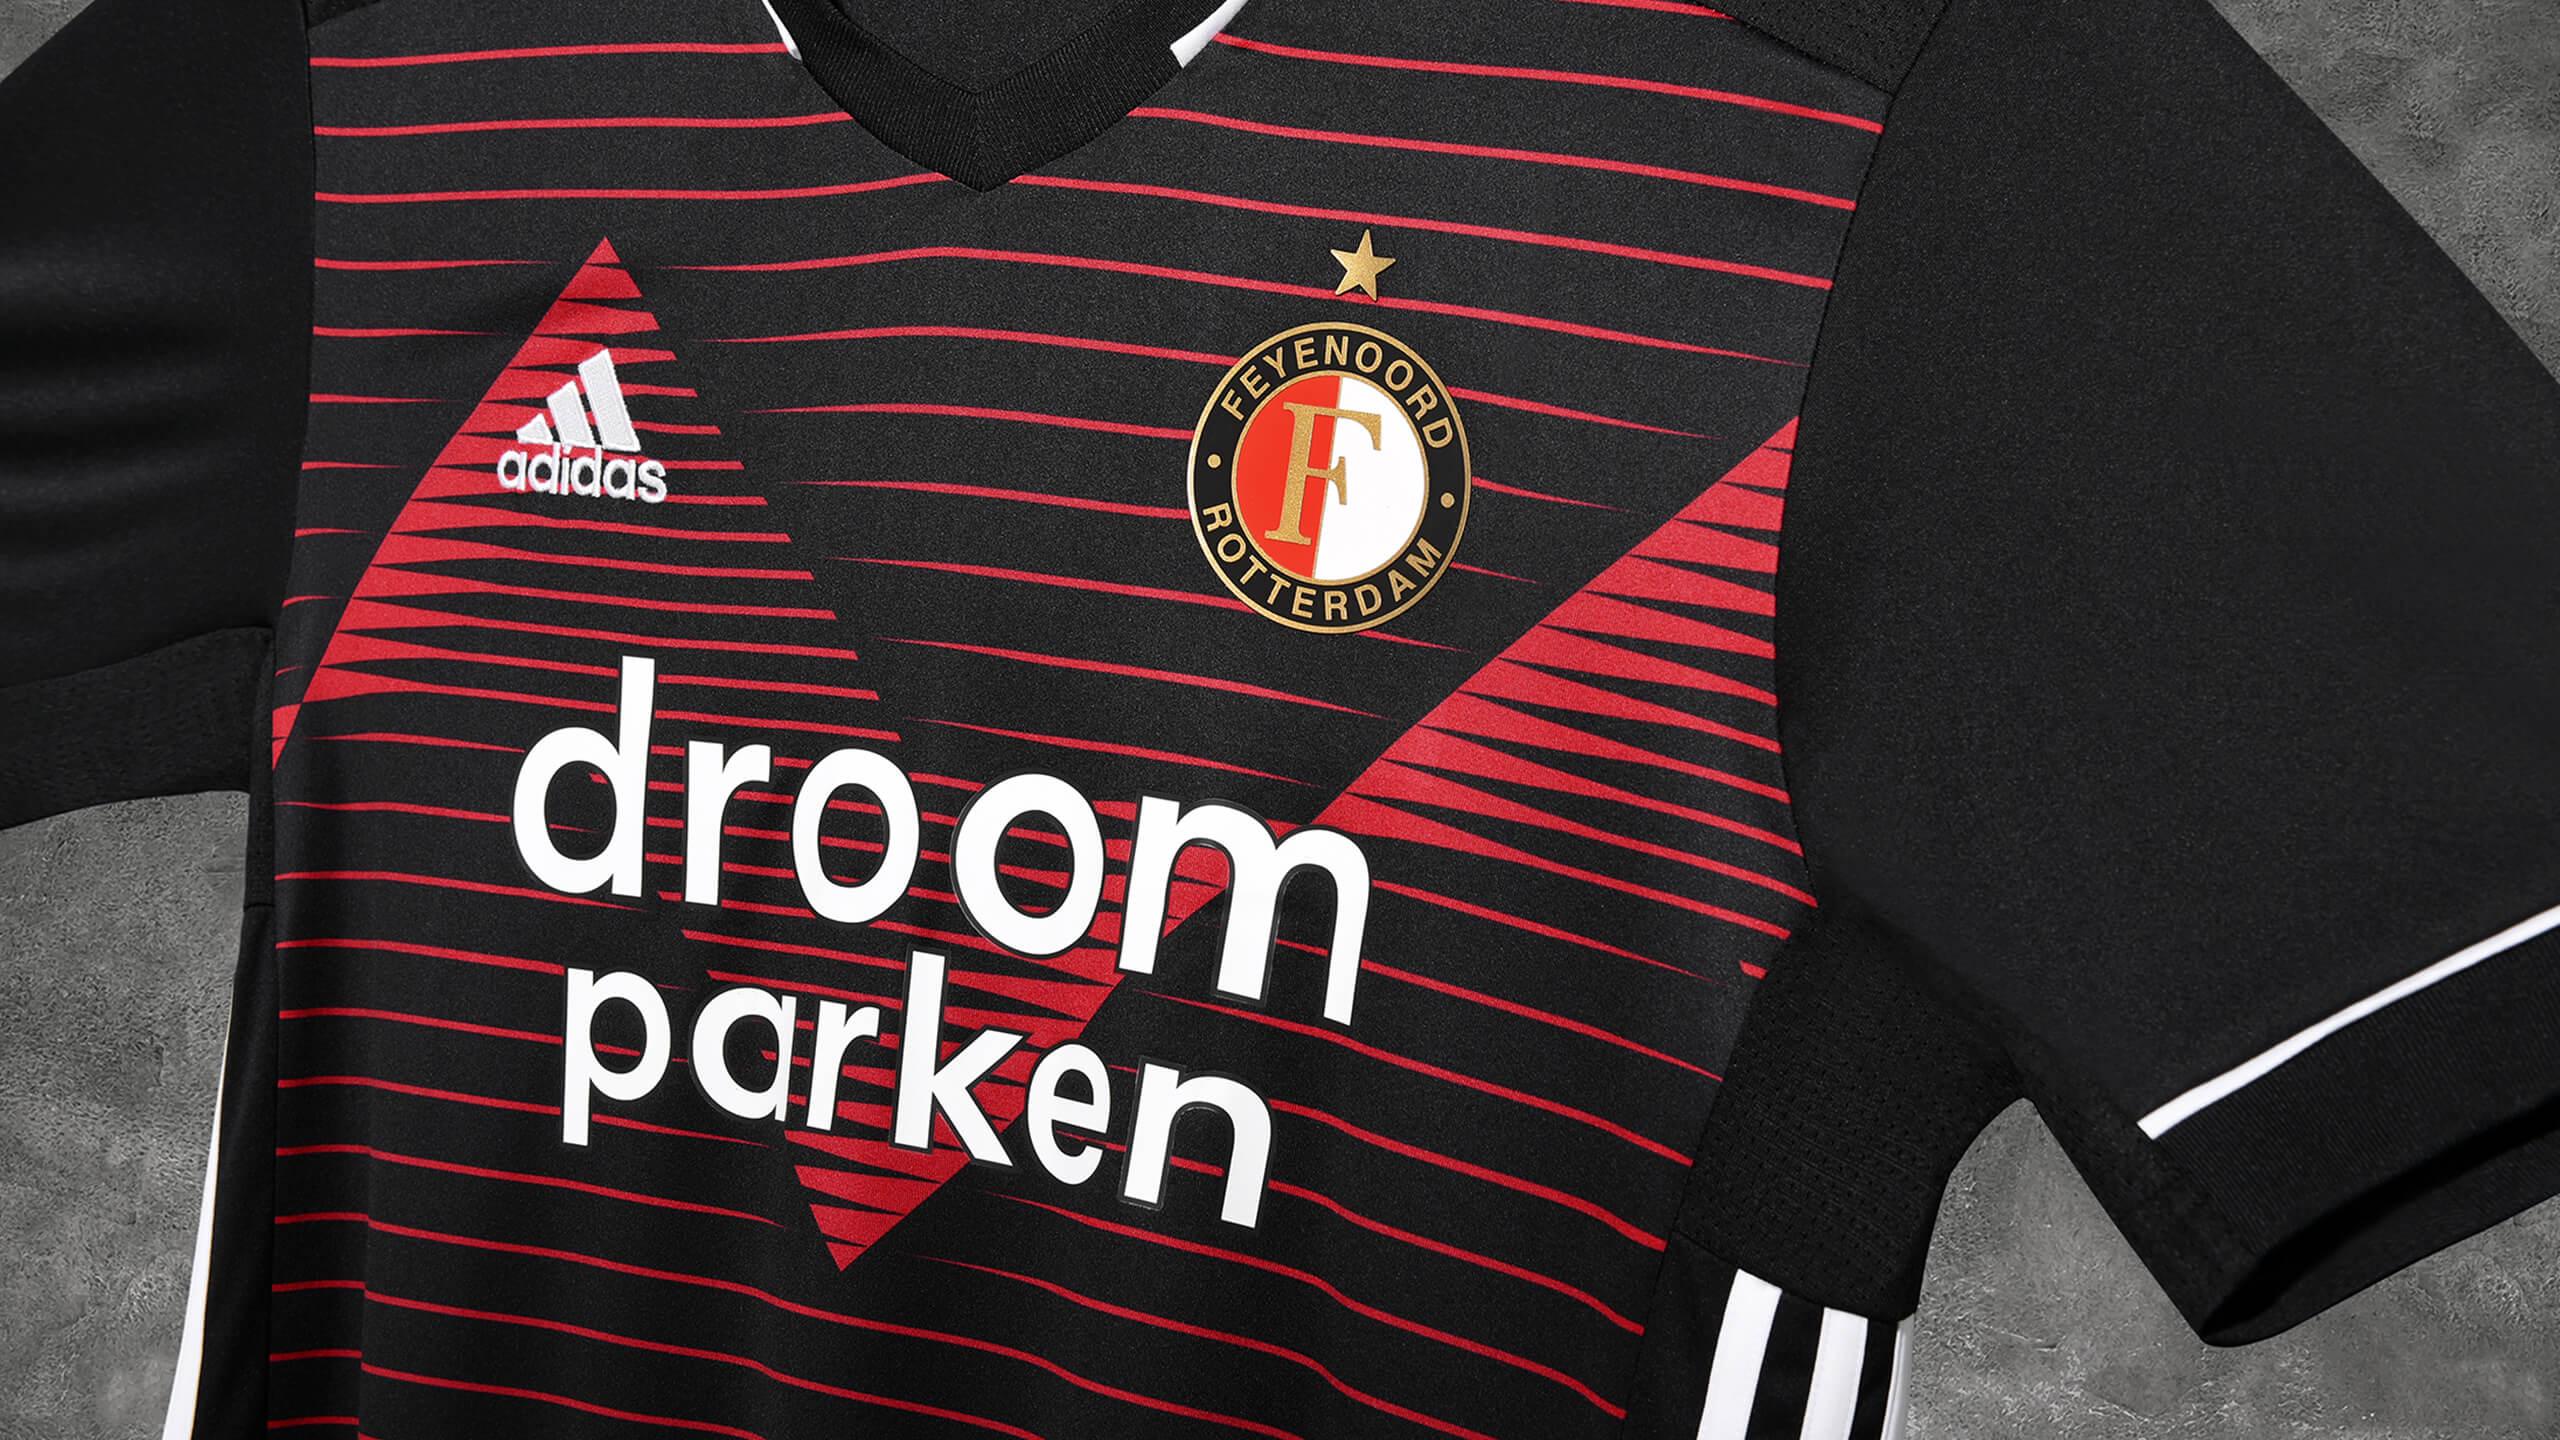 <b>Uittenue voor komend seizoen gepresenteerd</b>; image source: Feyenoord.nl